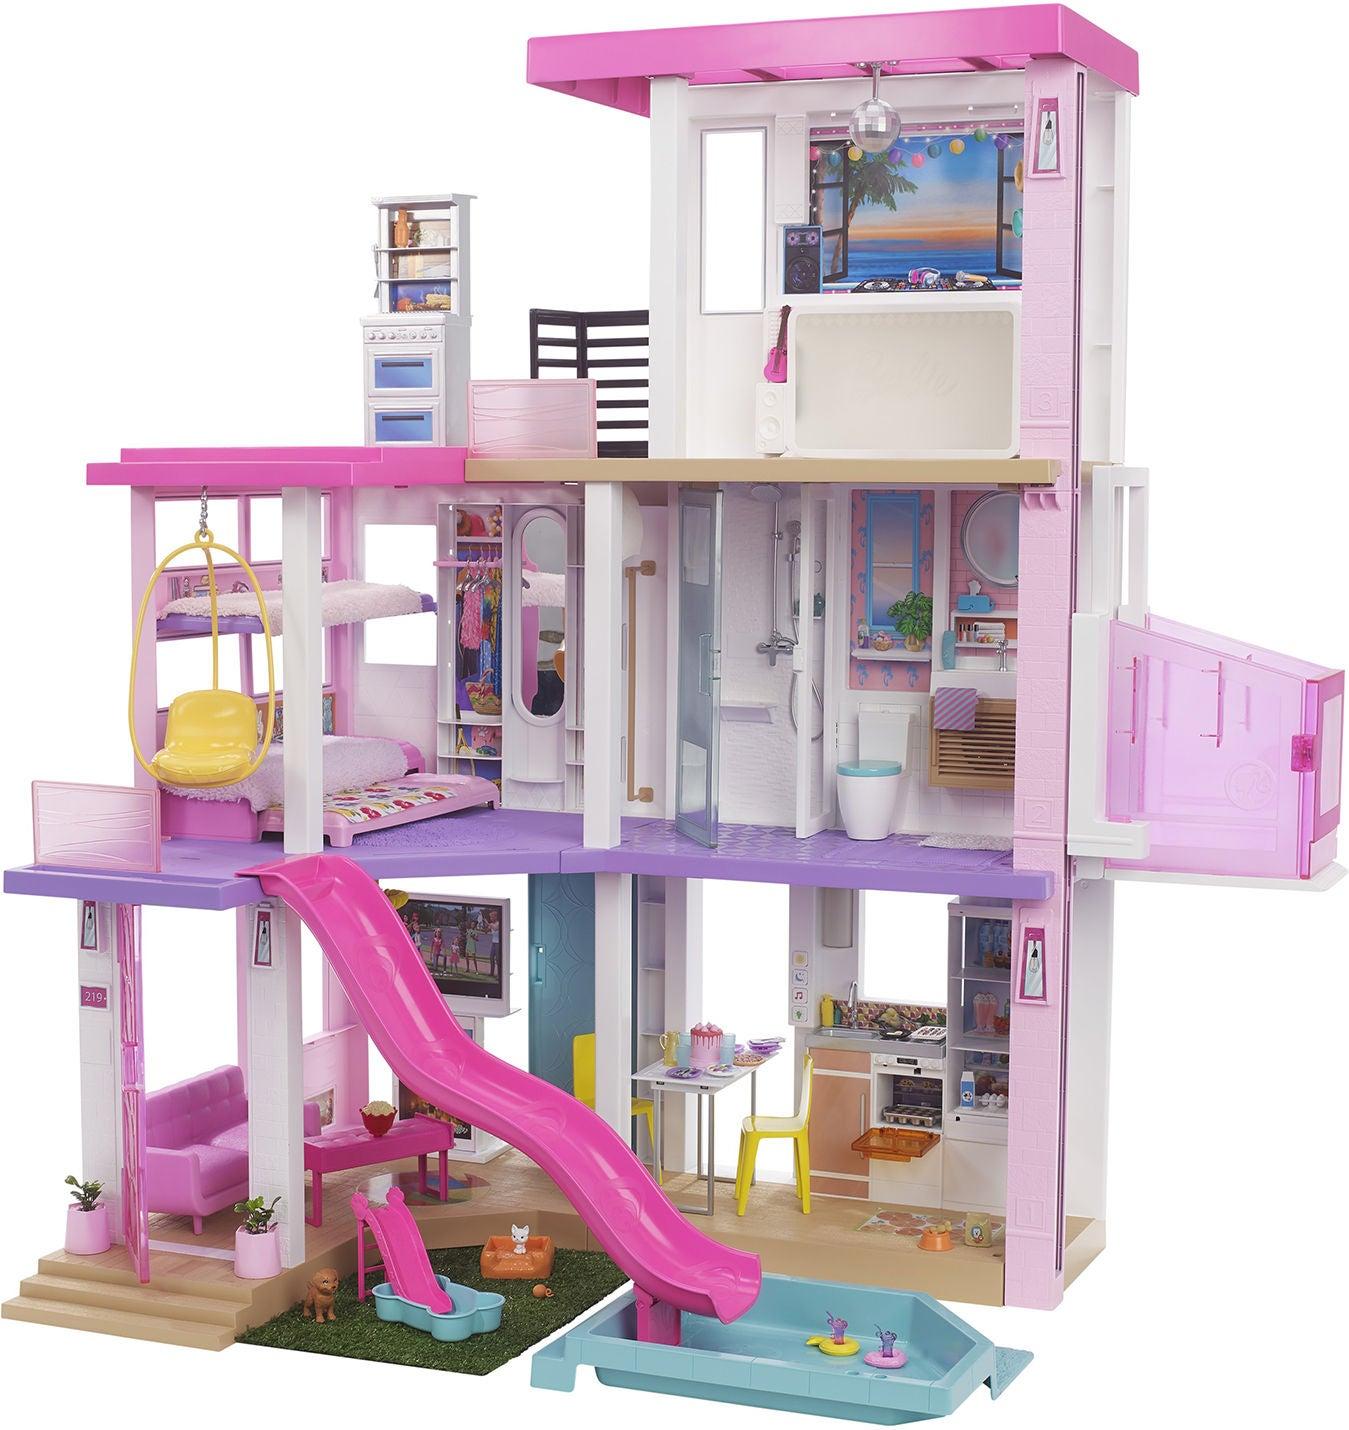 Barbie Dreamhouse 2021